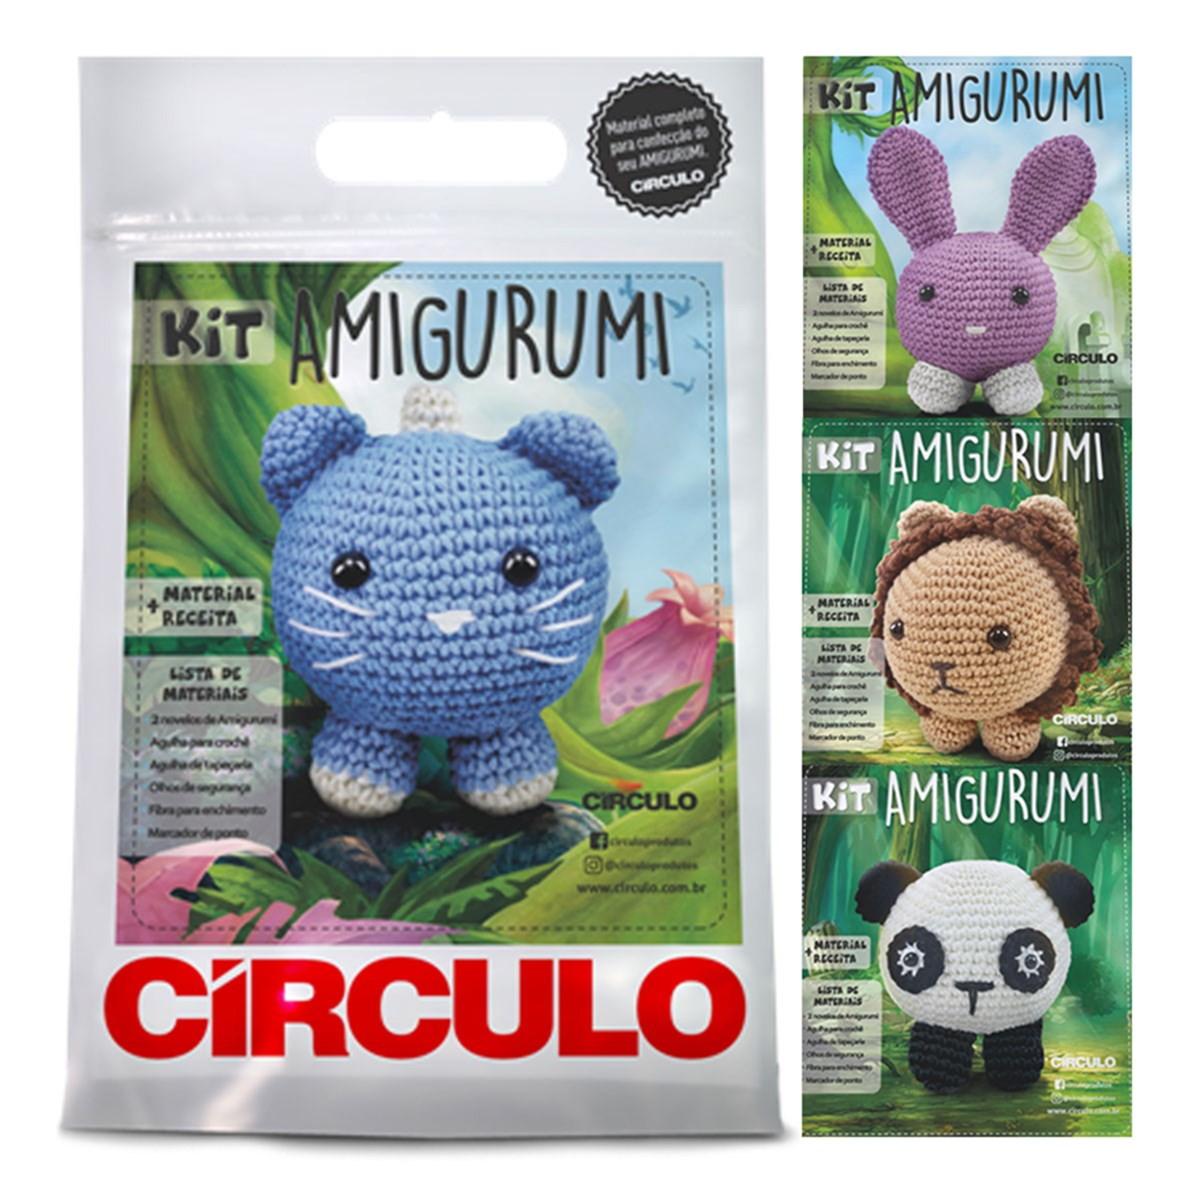 Kit Amigurumi Crochê Círculo S/A | 1200x1200